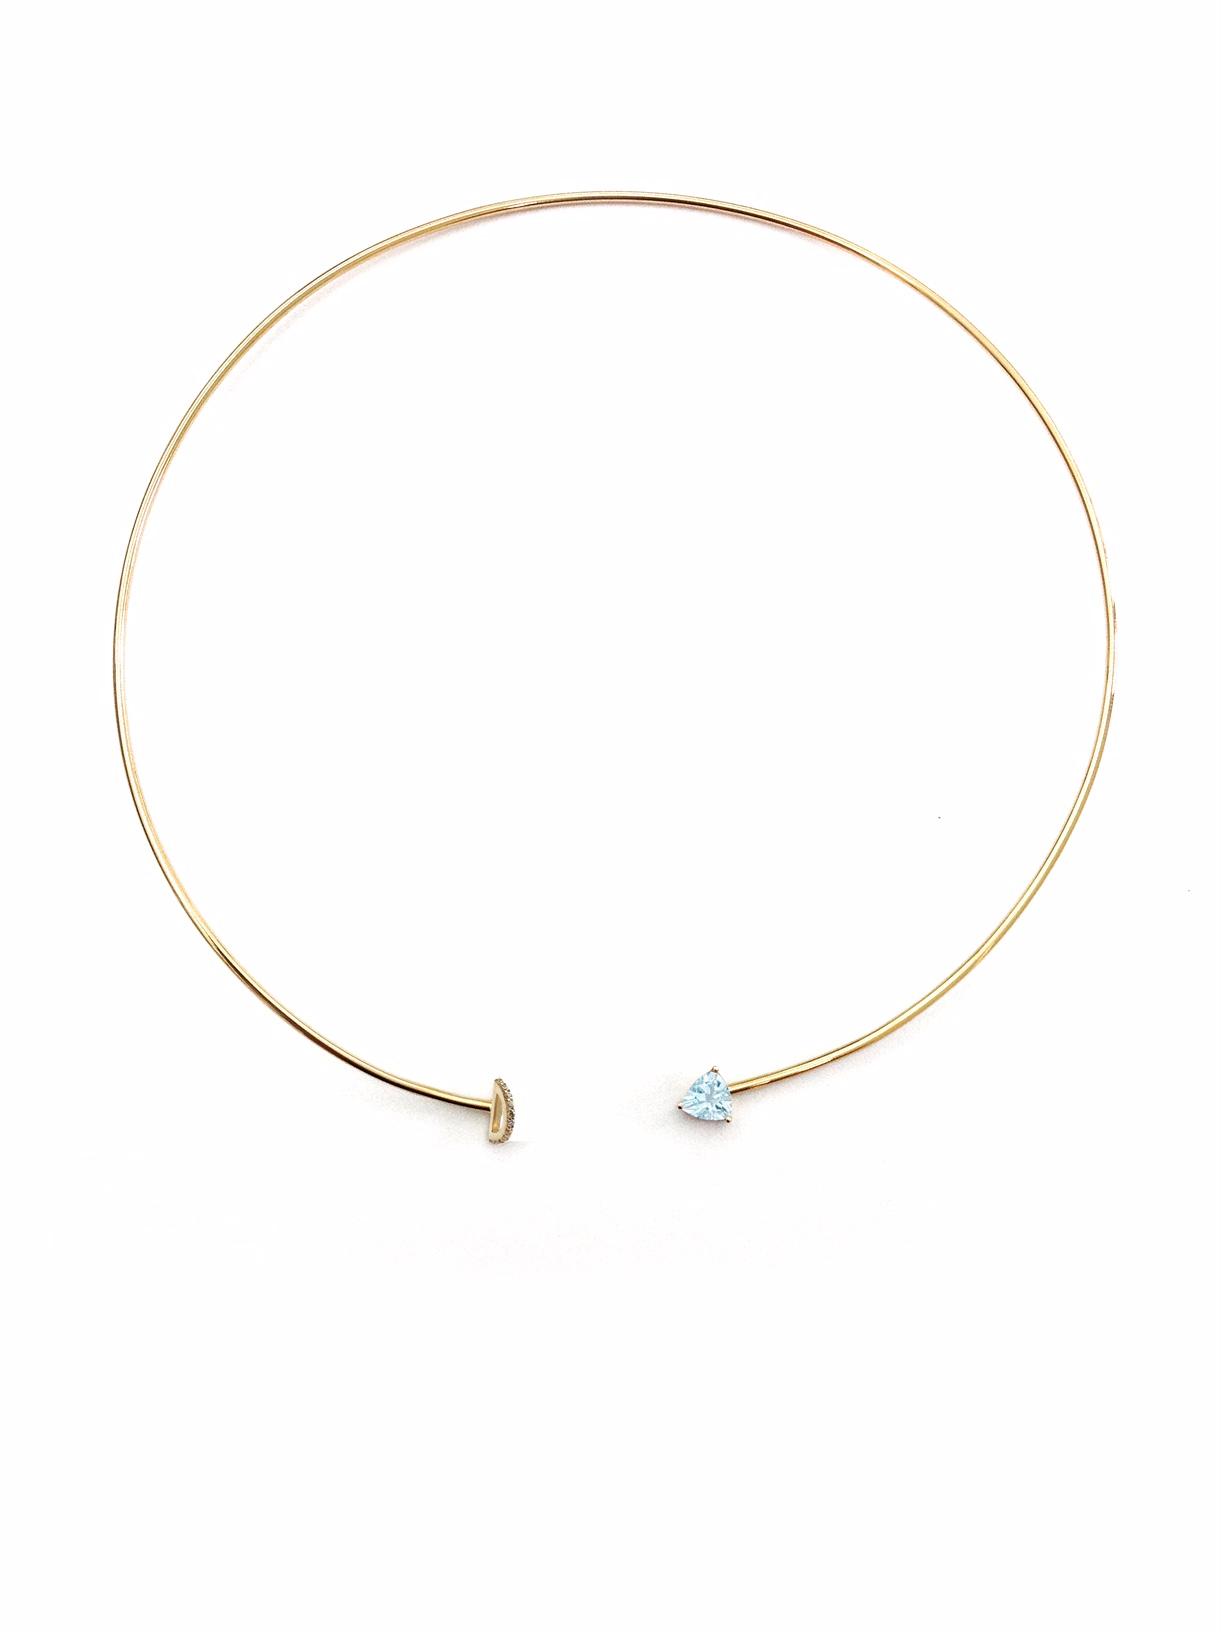 Marta N04200 Collar -Torque with Half circle pave-YG-AQ.jpg